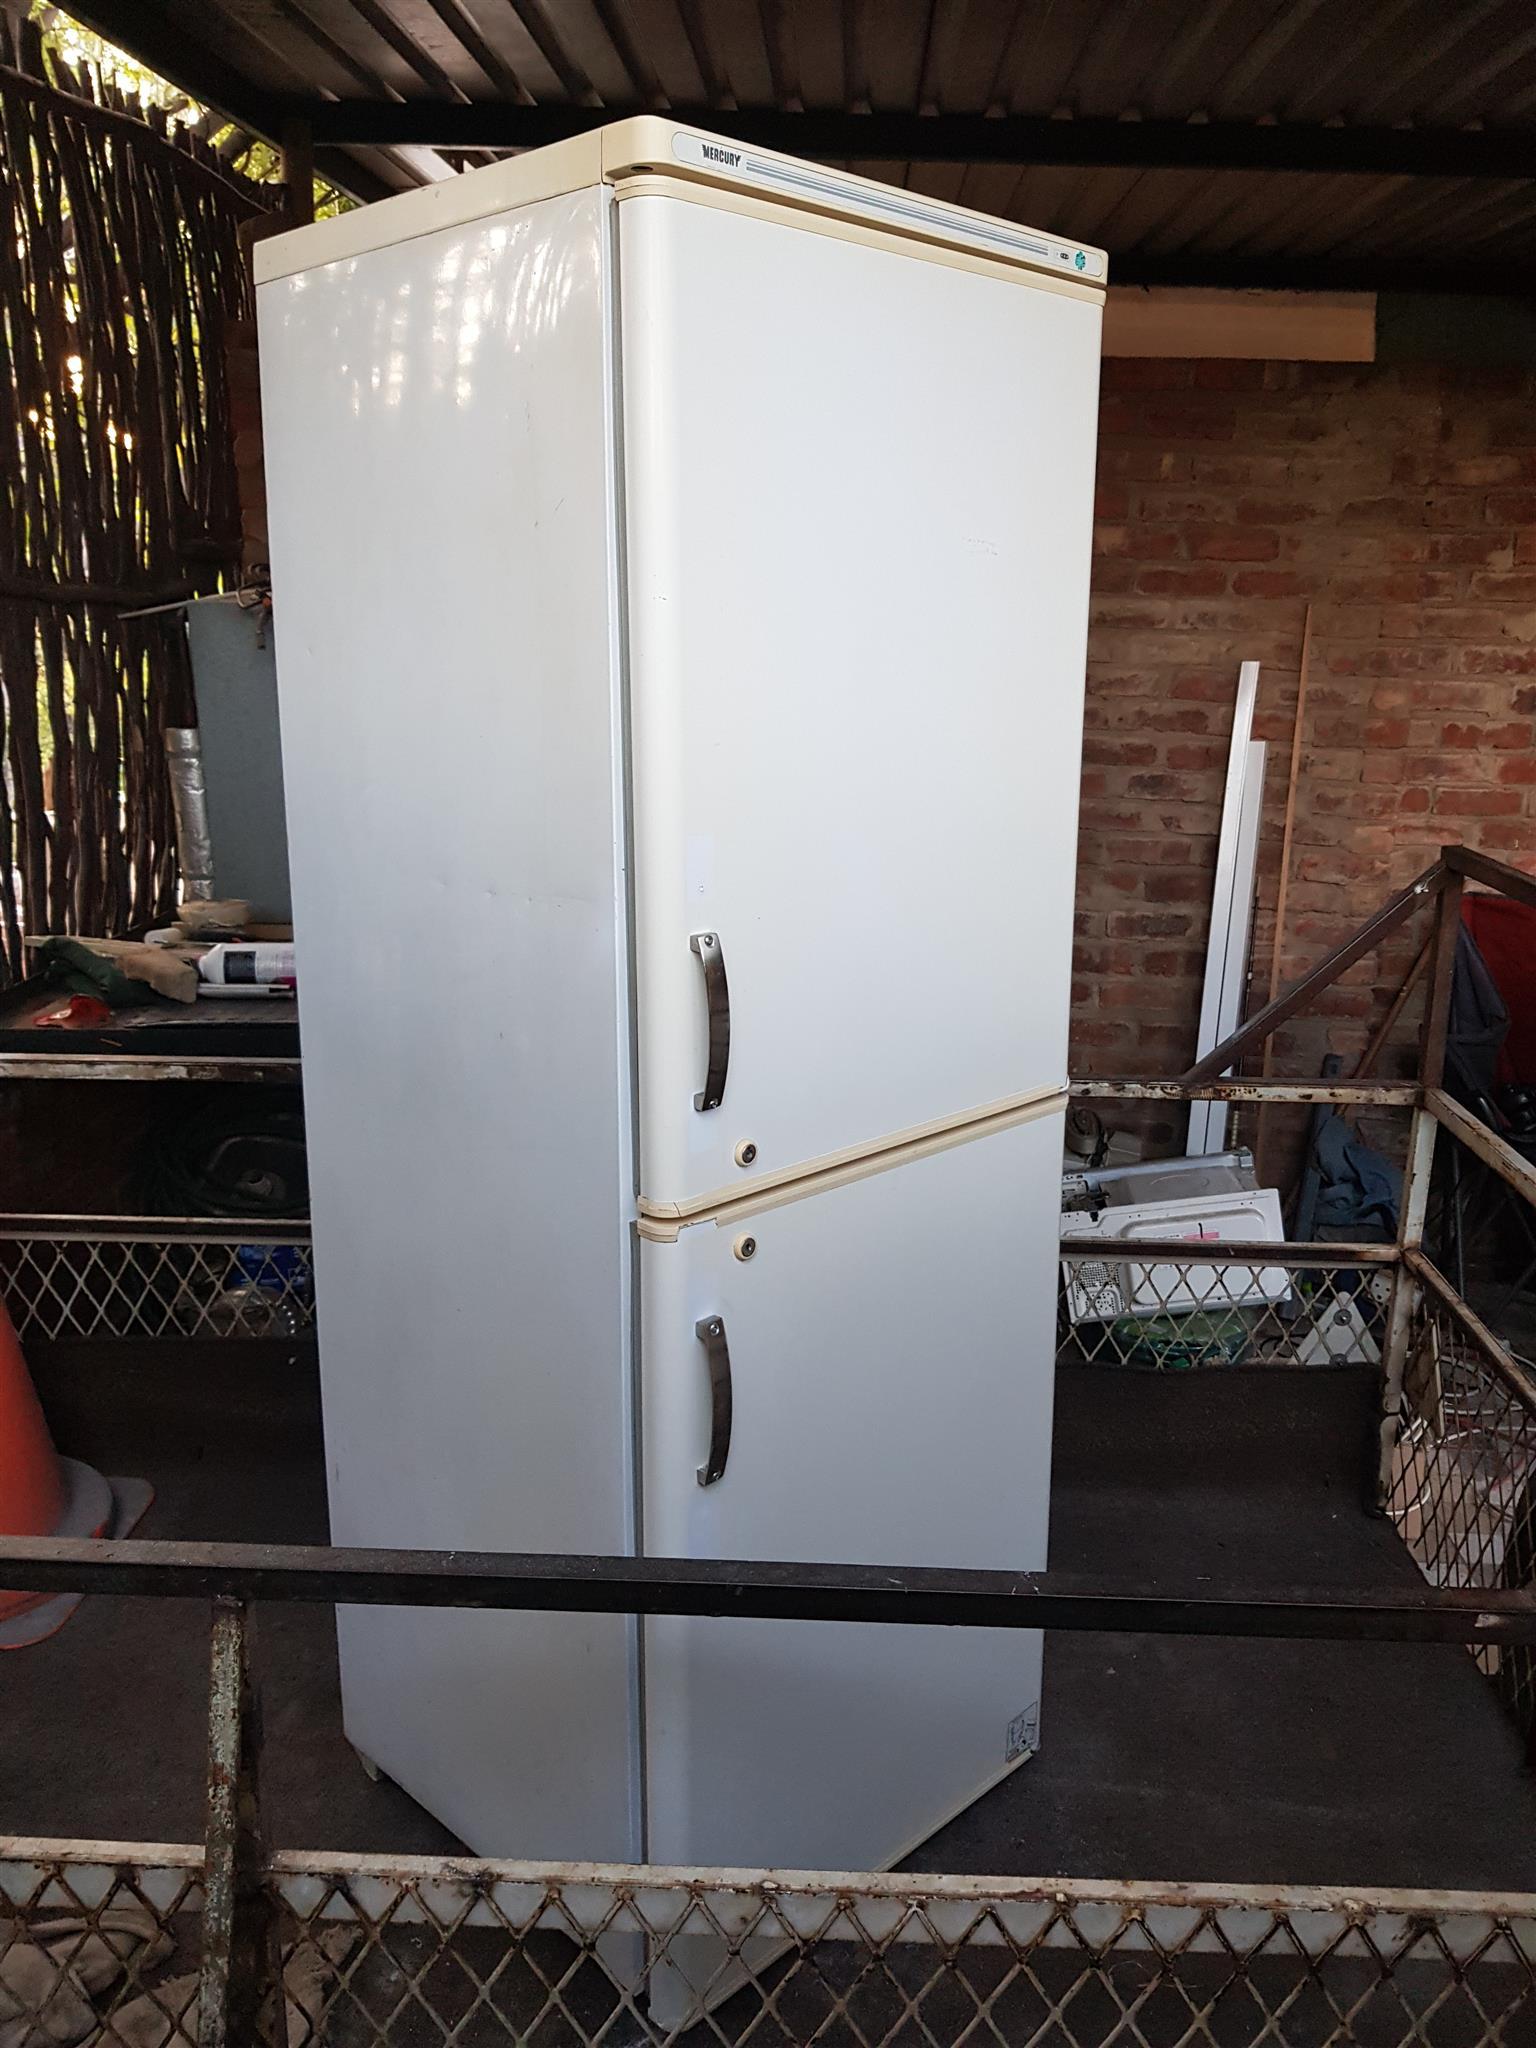 white mercury 300 liter double door fridge freezer combo. Black Bedroom Furniture Sets. Home Design Ideas